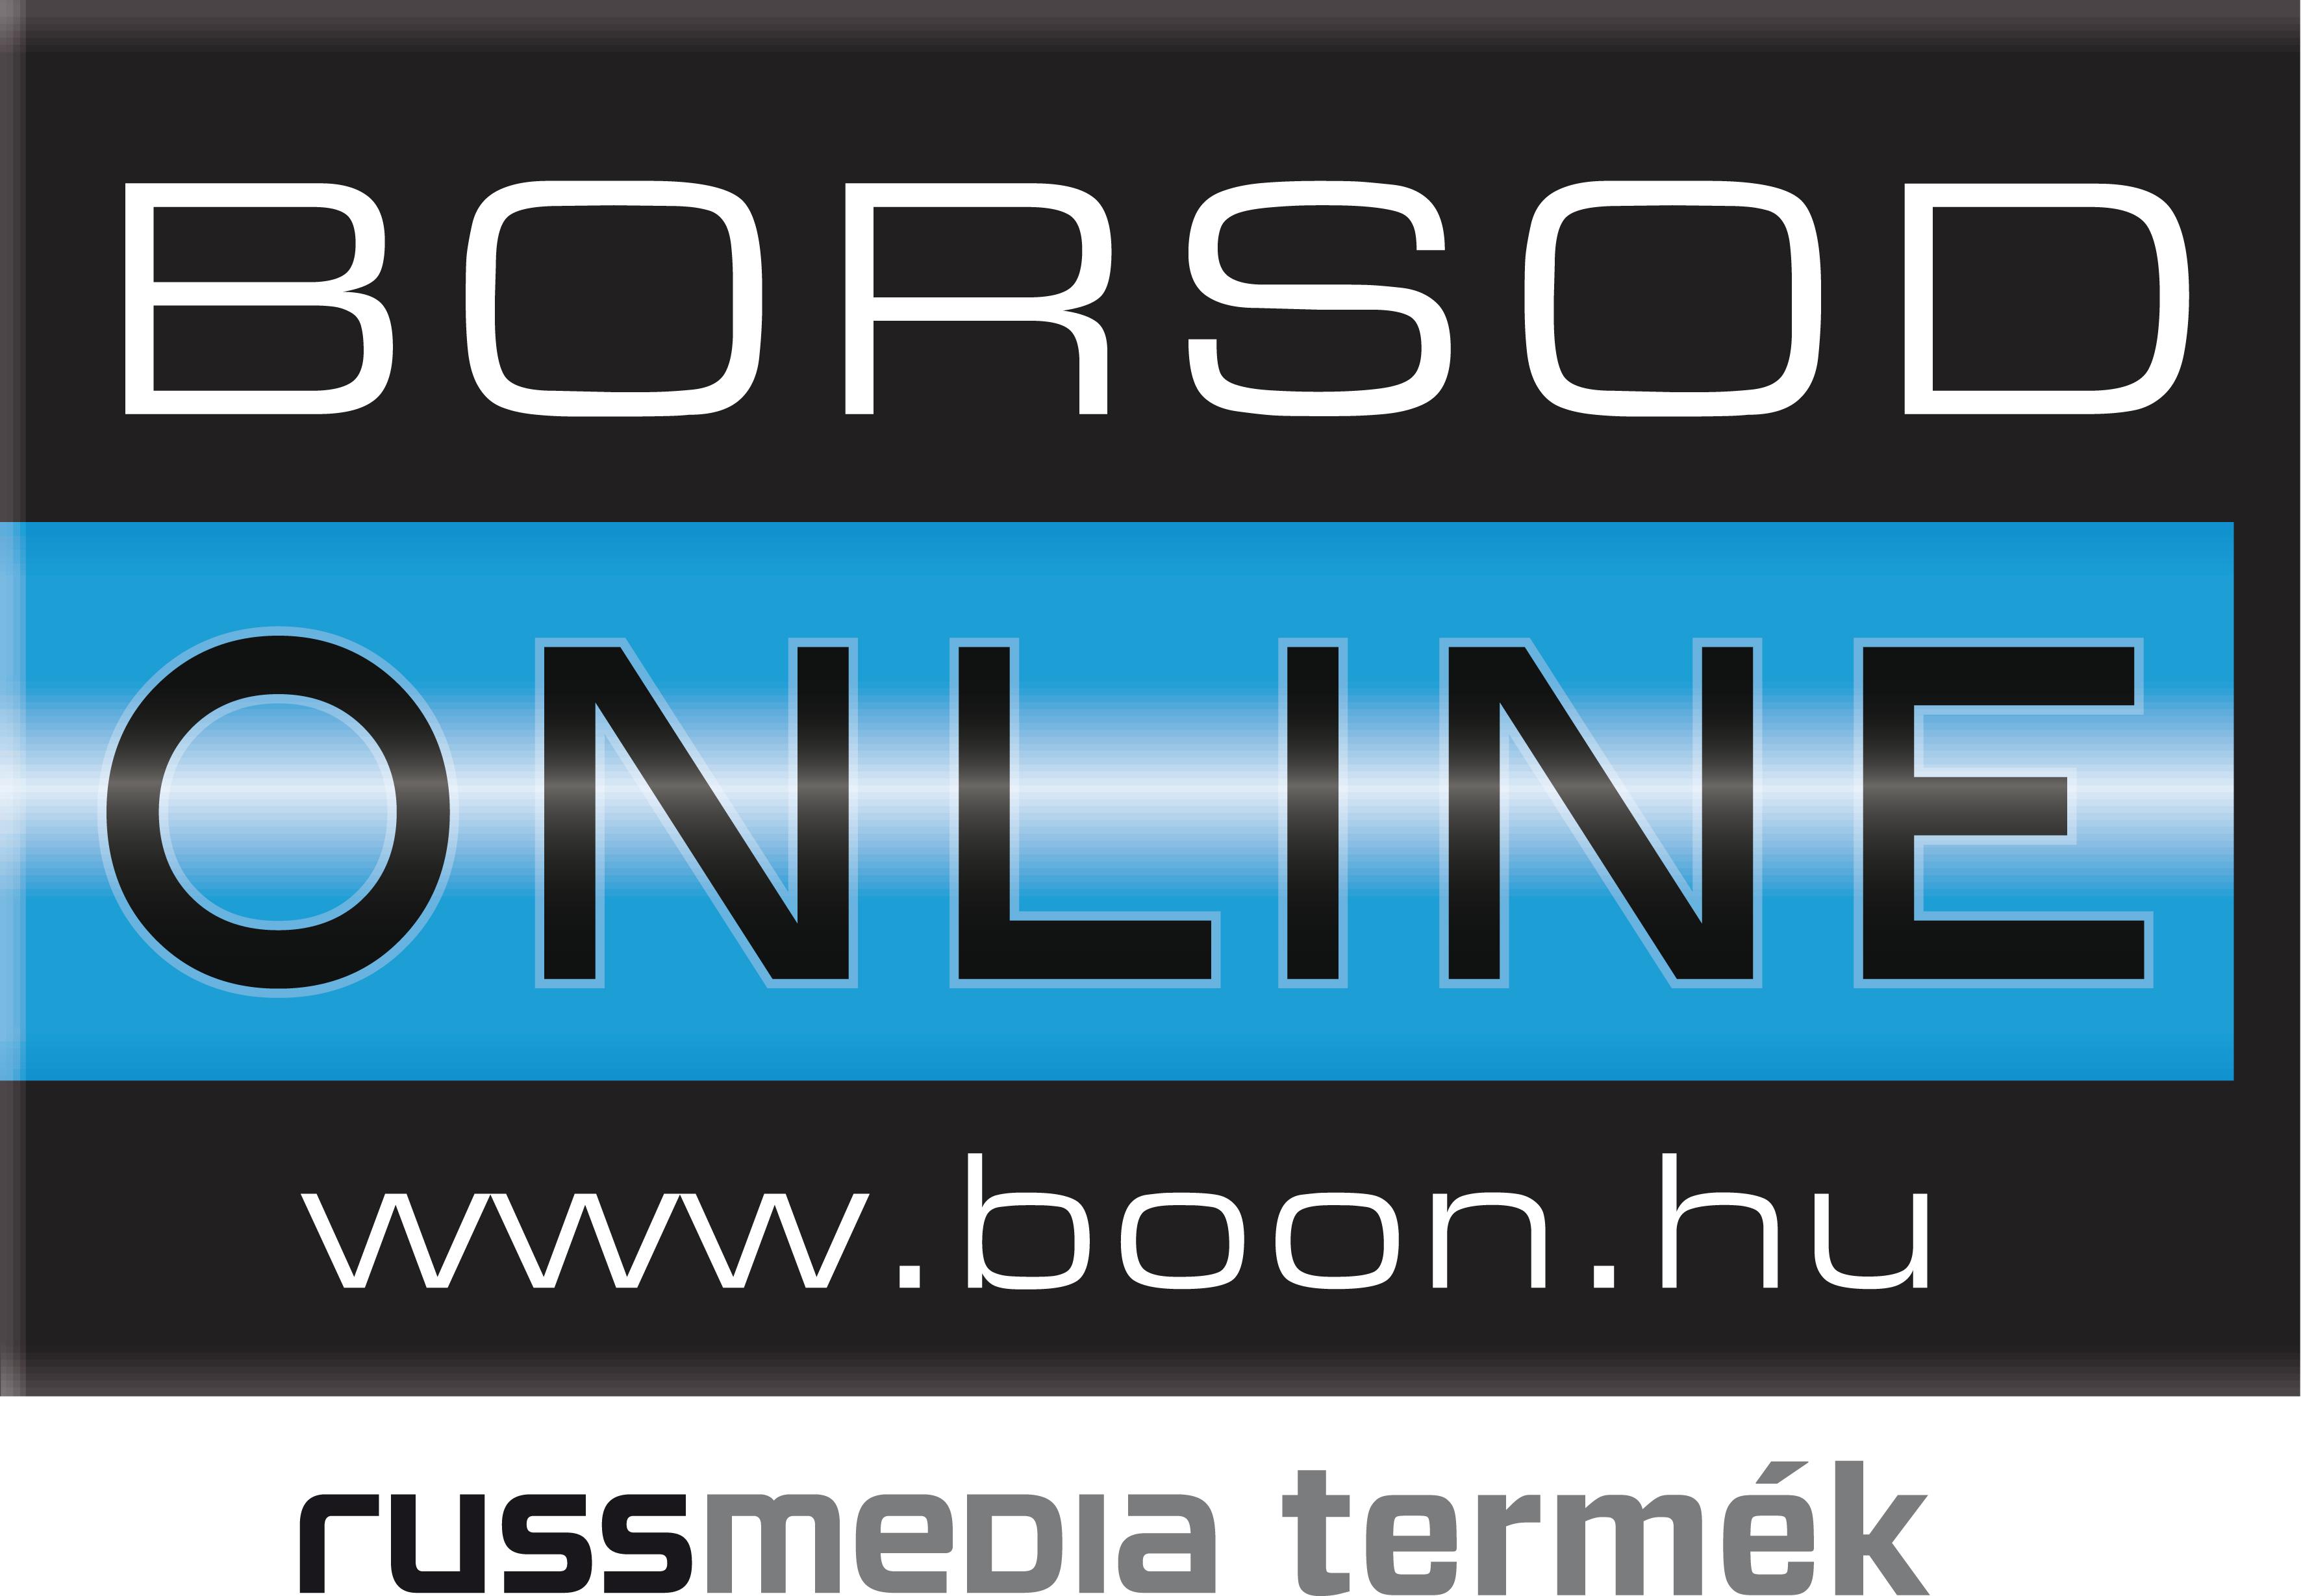 Borsod Online